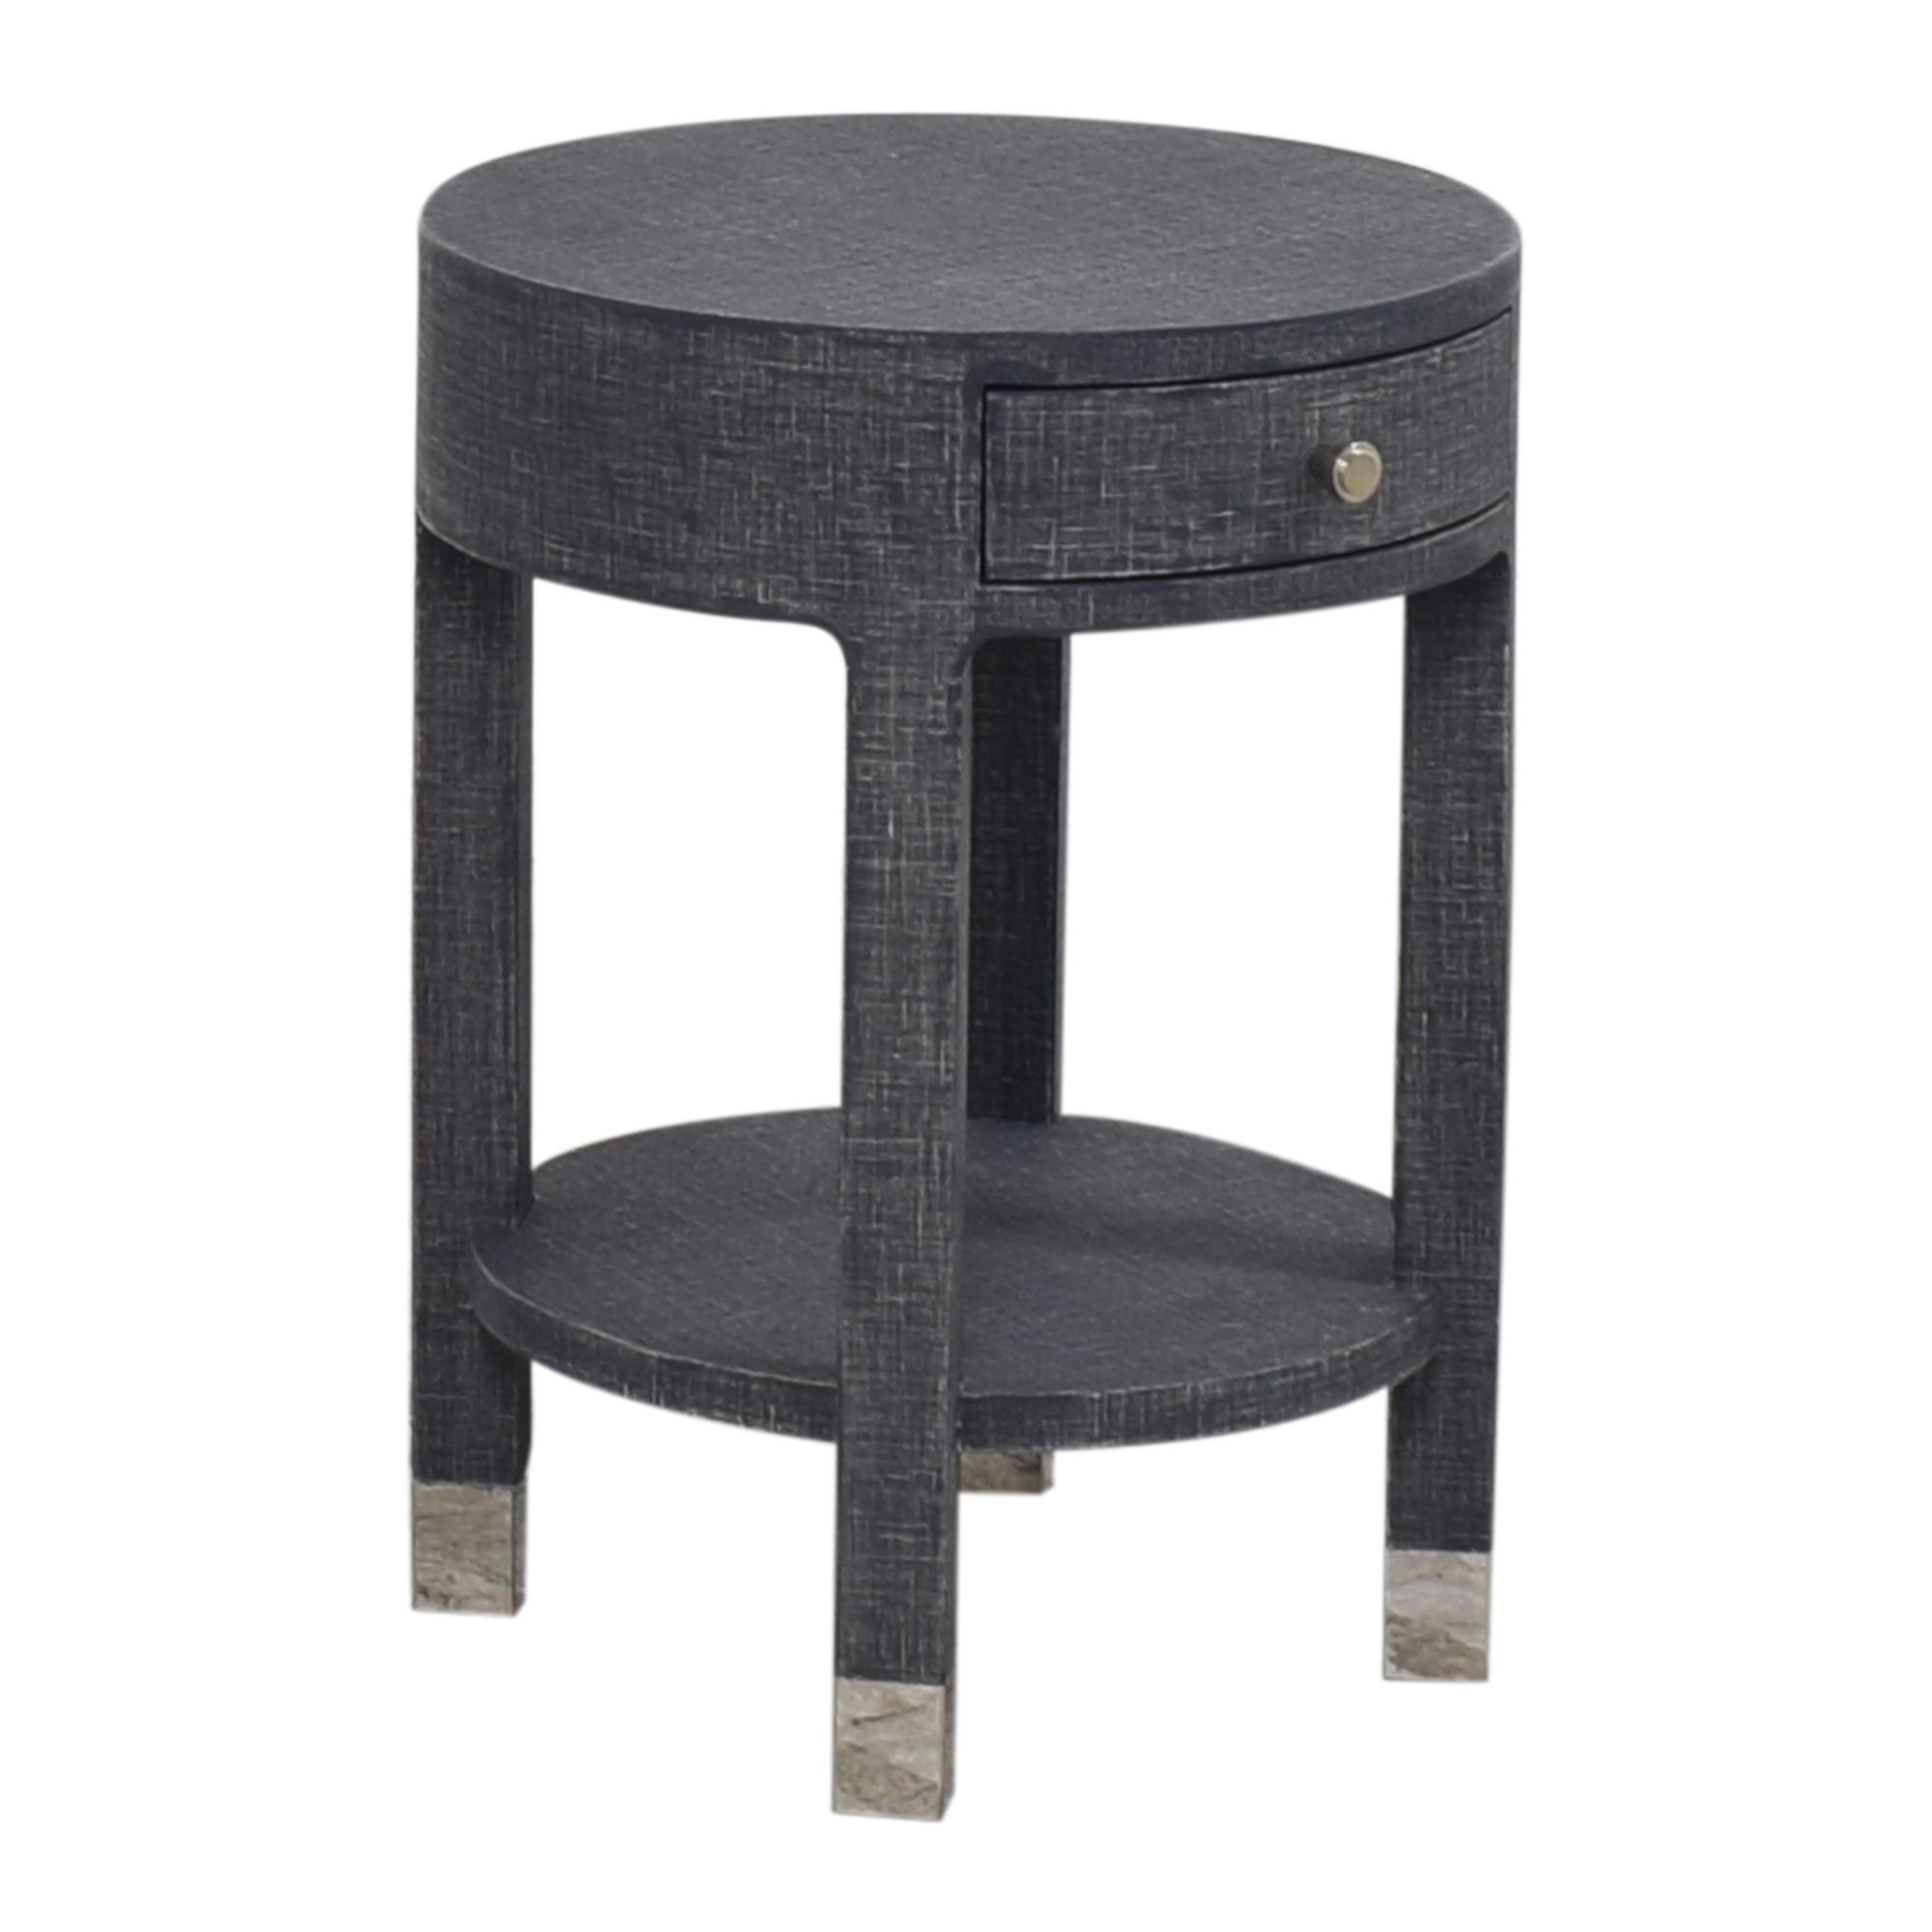 Bungalow 5 Dakota Round Side Table / End Tables